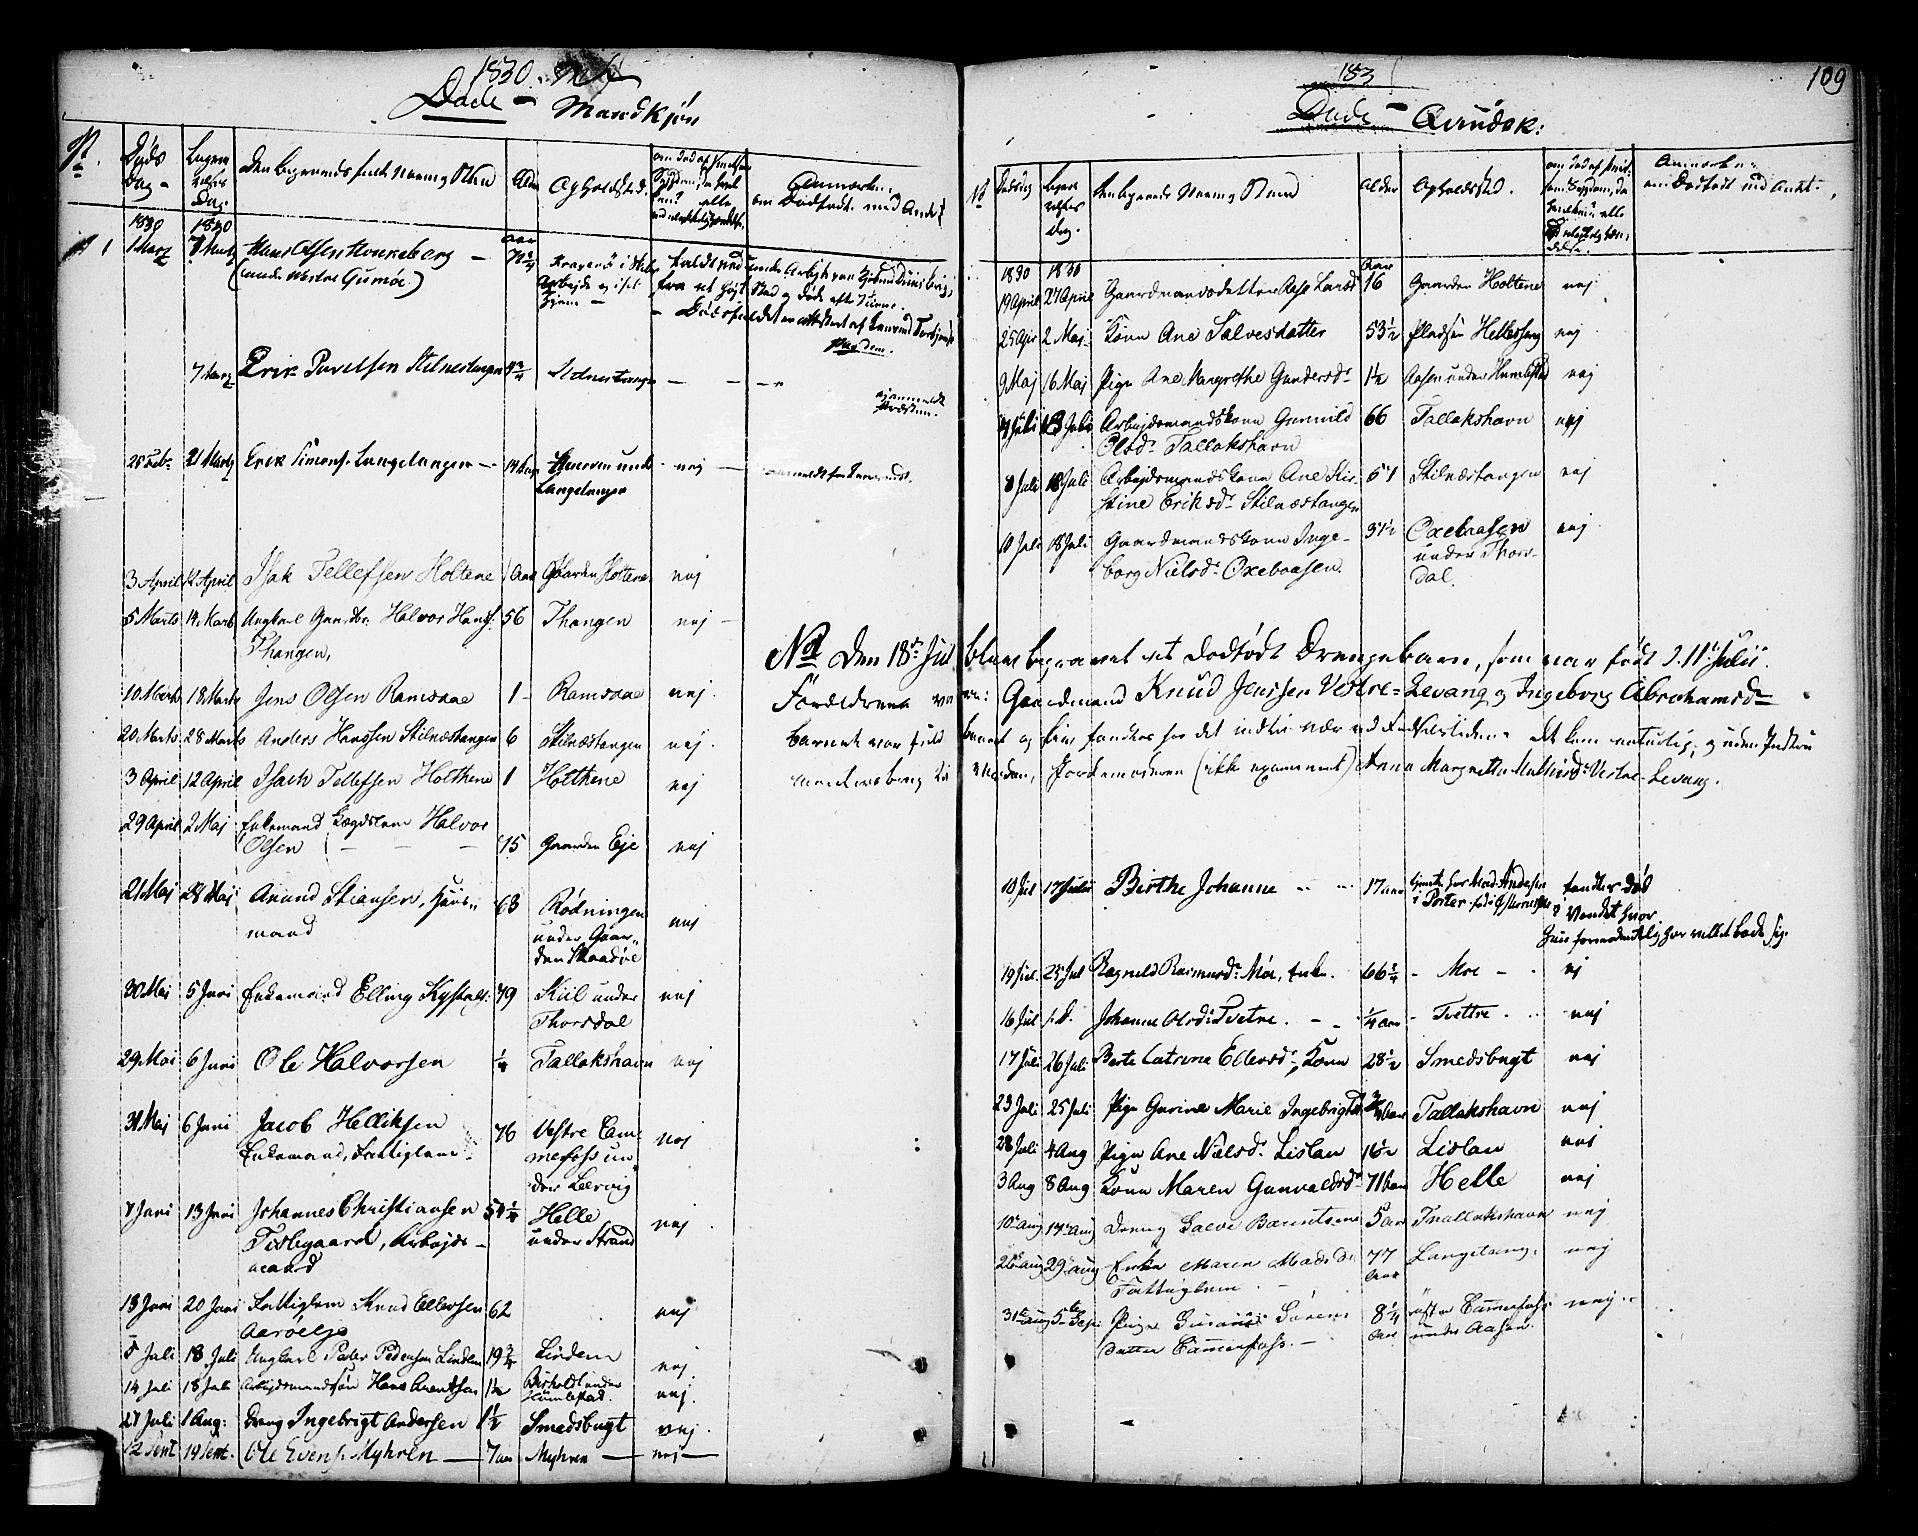 SAKO, Kragerø kirkebøker, F/Fa/L0002: Ministerialbok nr. 2, 1767-1802, s. 109